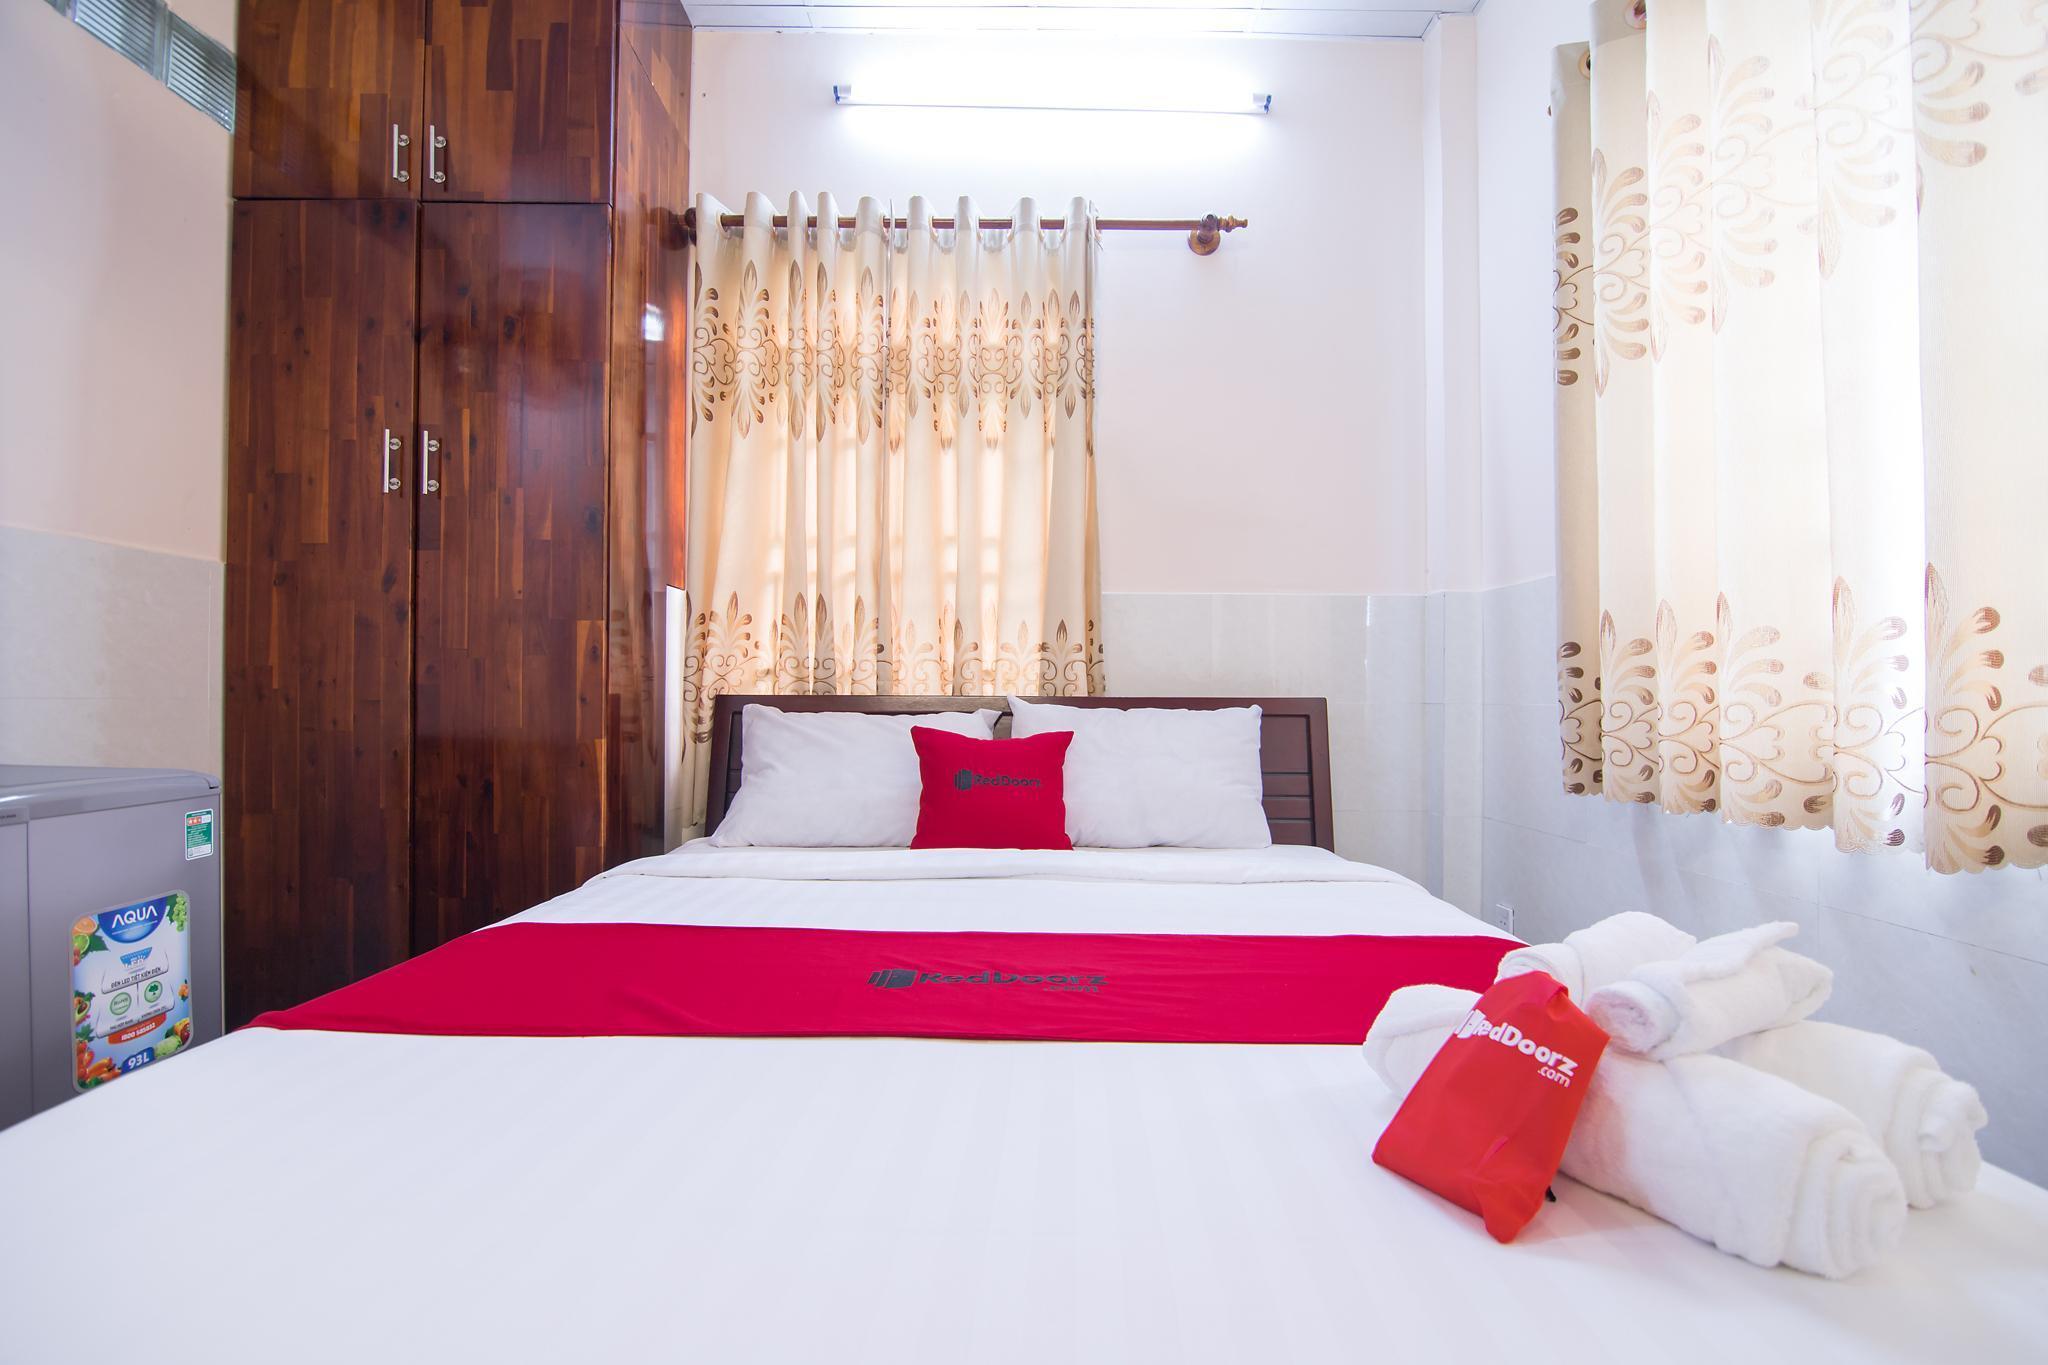 RedDoorz Near Khu Che Xuat Tan Thuan 2